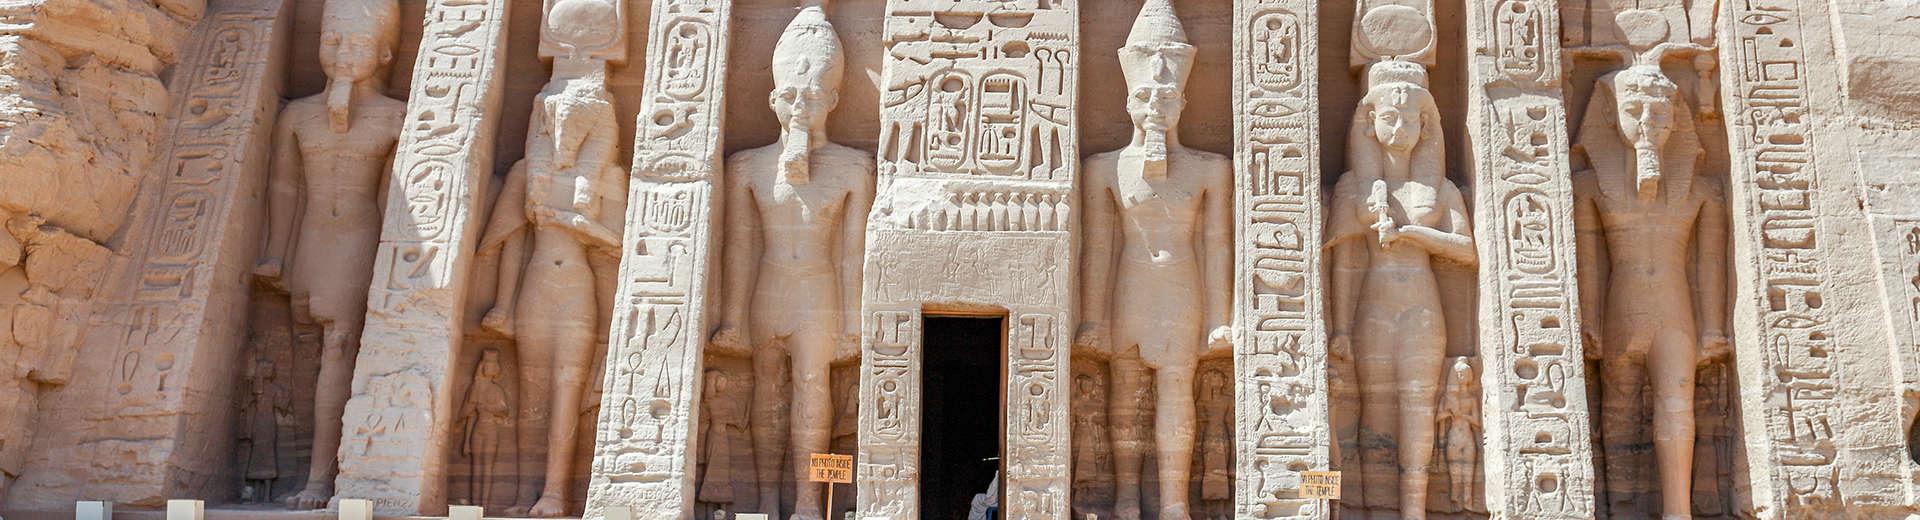 egypt abu simbel cairo